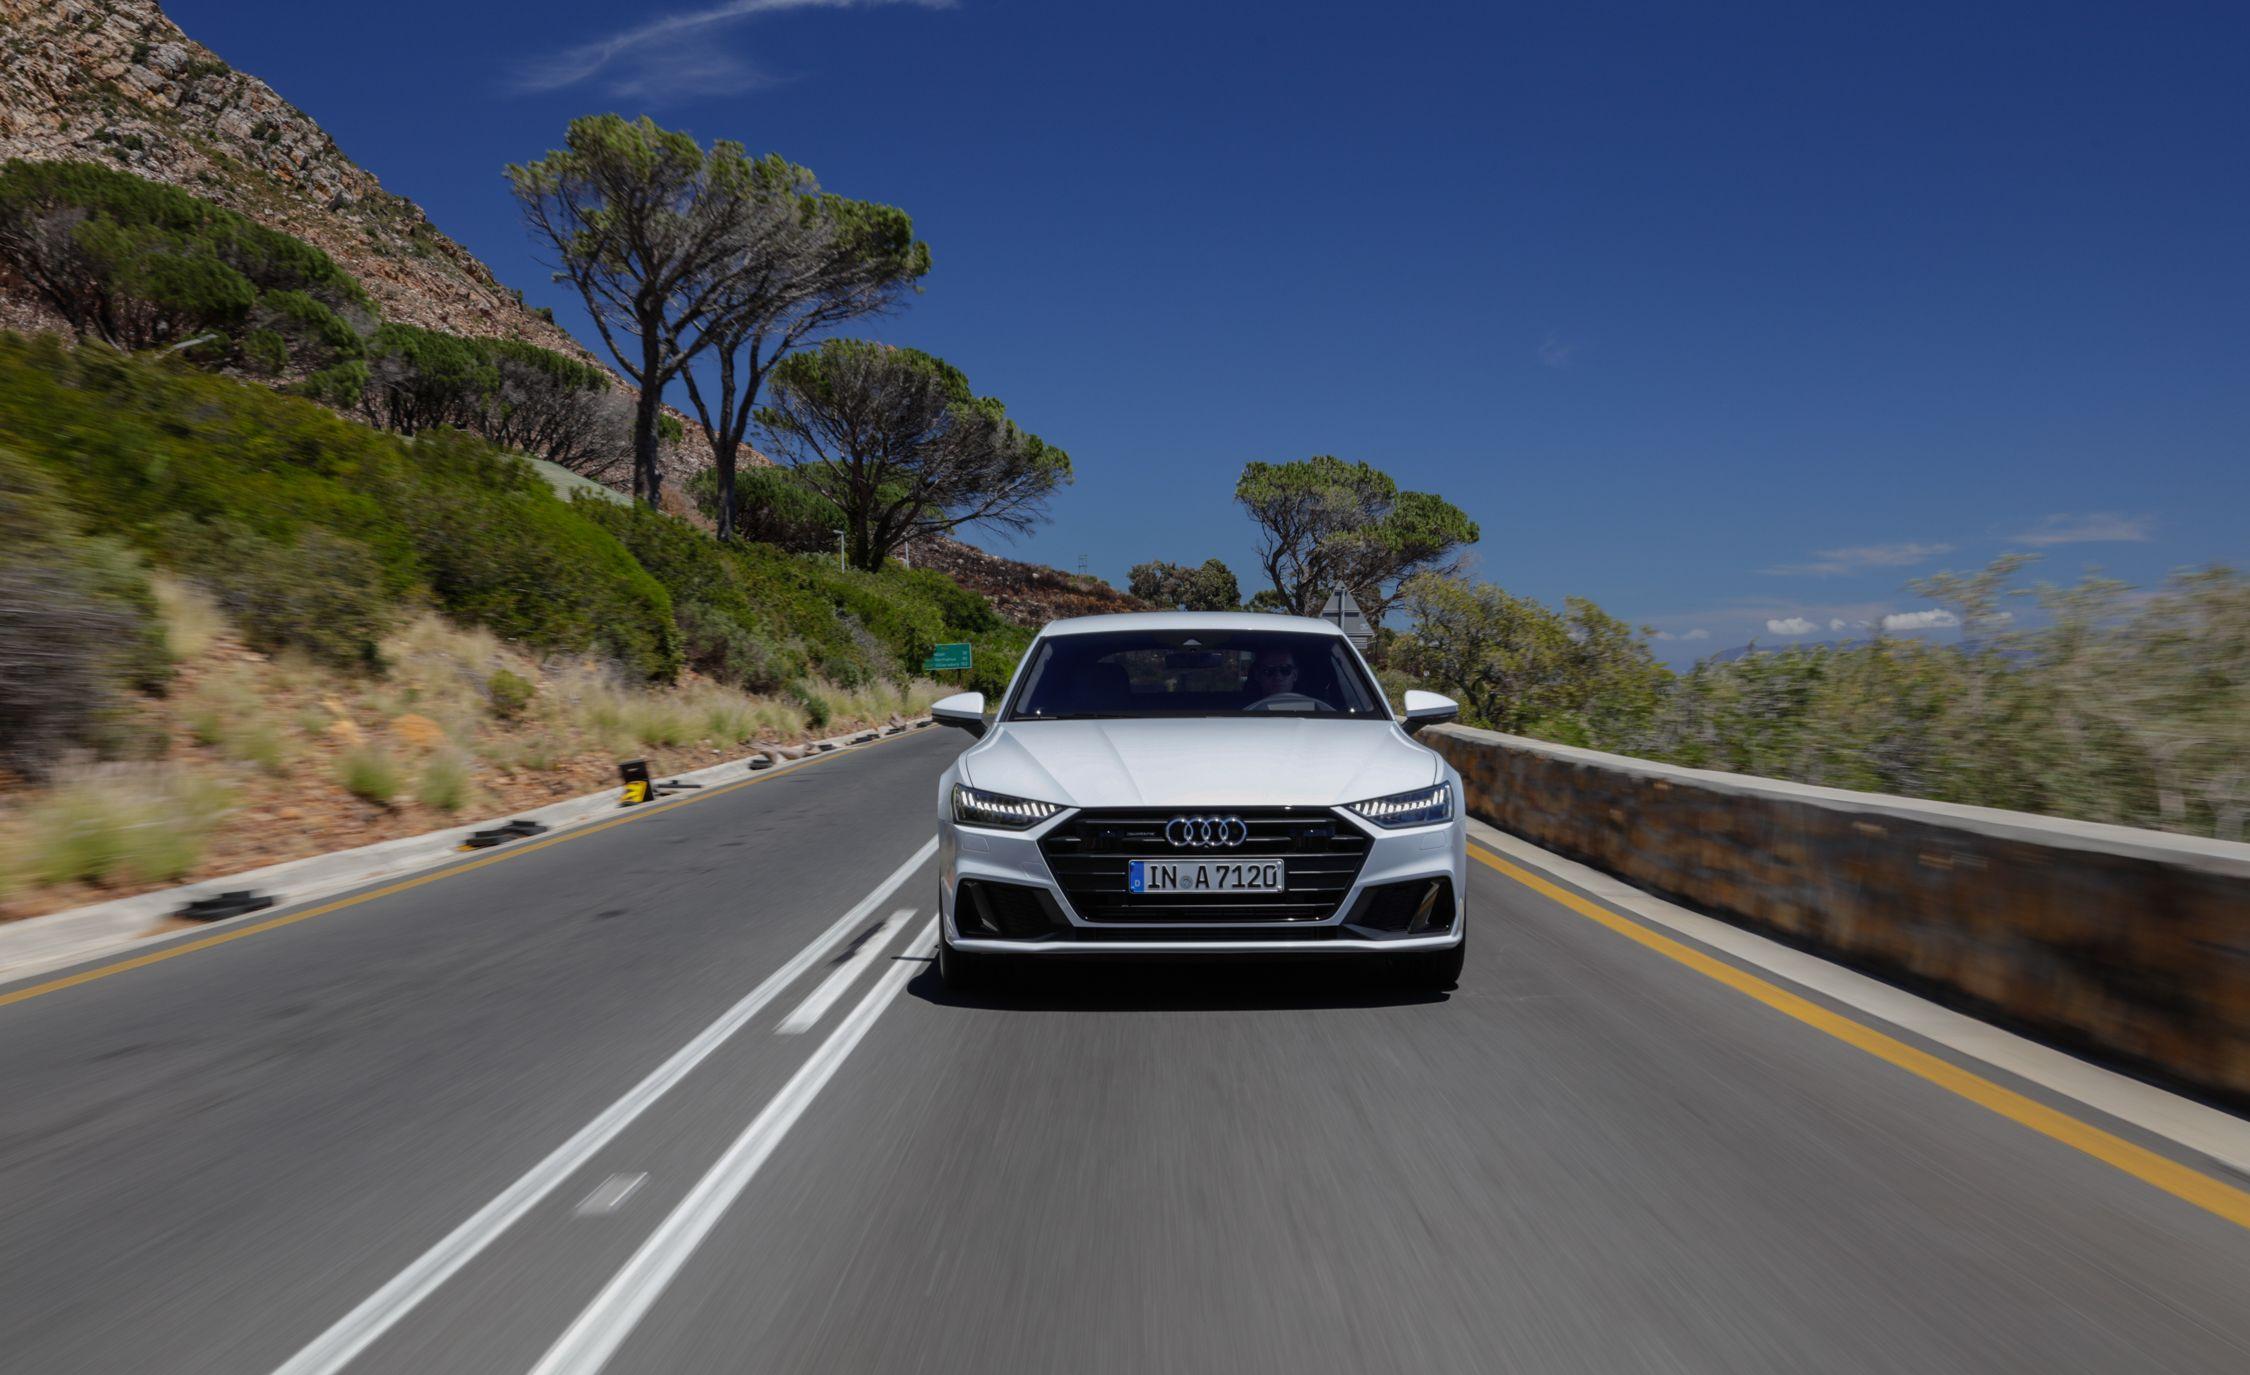 2019-Audi-A7-Sportback-183-1.jpg